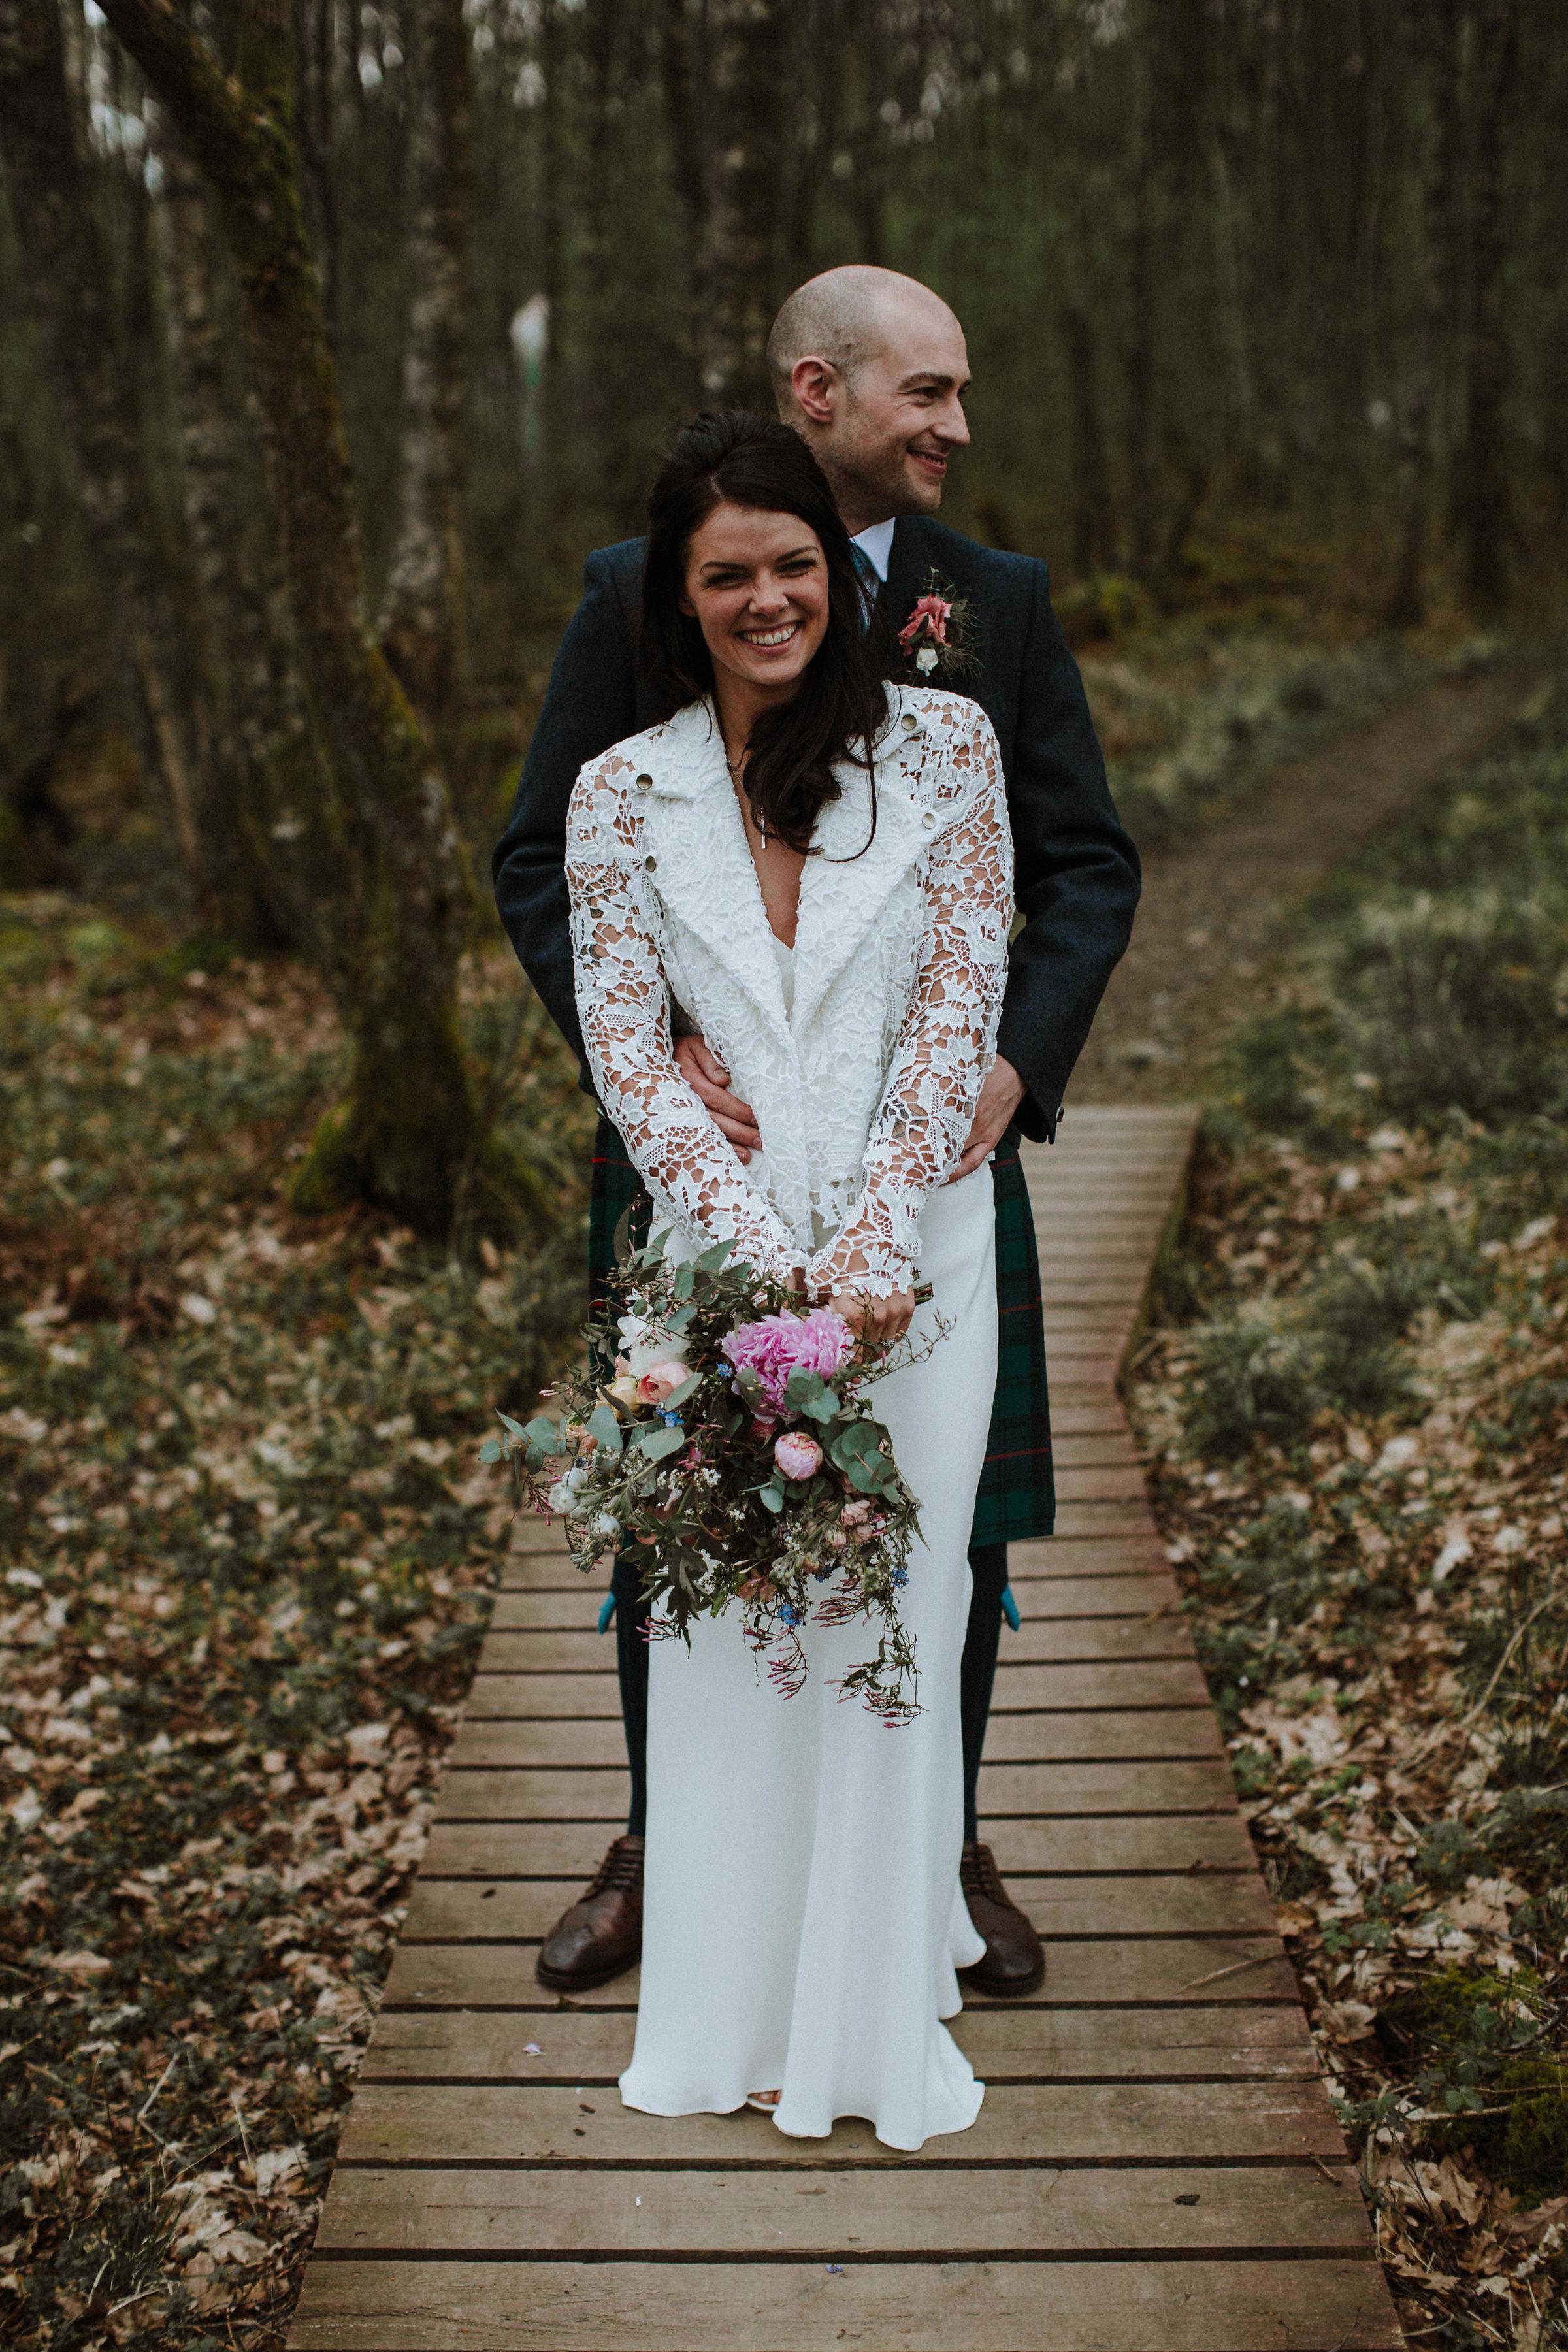 Katt-Scotland-Comrie-Crieff-Bias-Crepe-Wedding-Gown-Lace-Bridal-Biker-Jacket-Bespoke-Susanna-Greening-Derbyshire-19